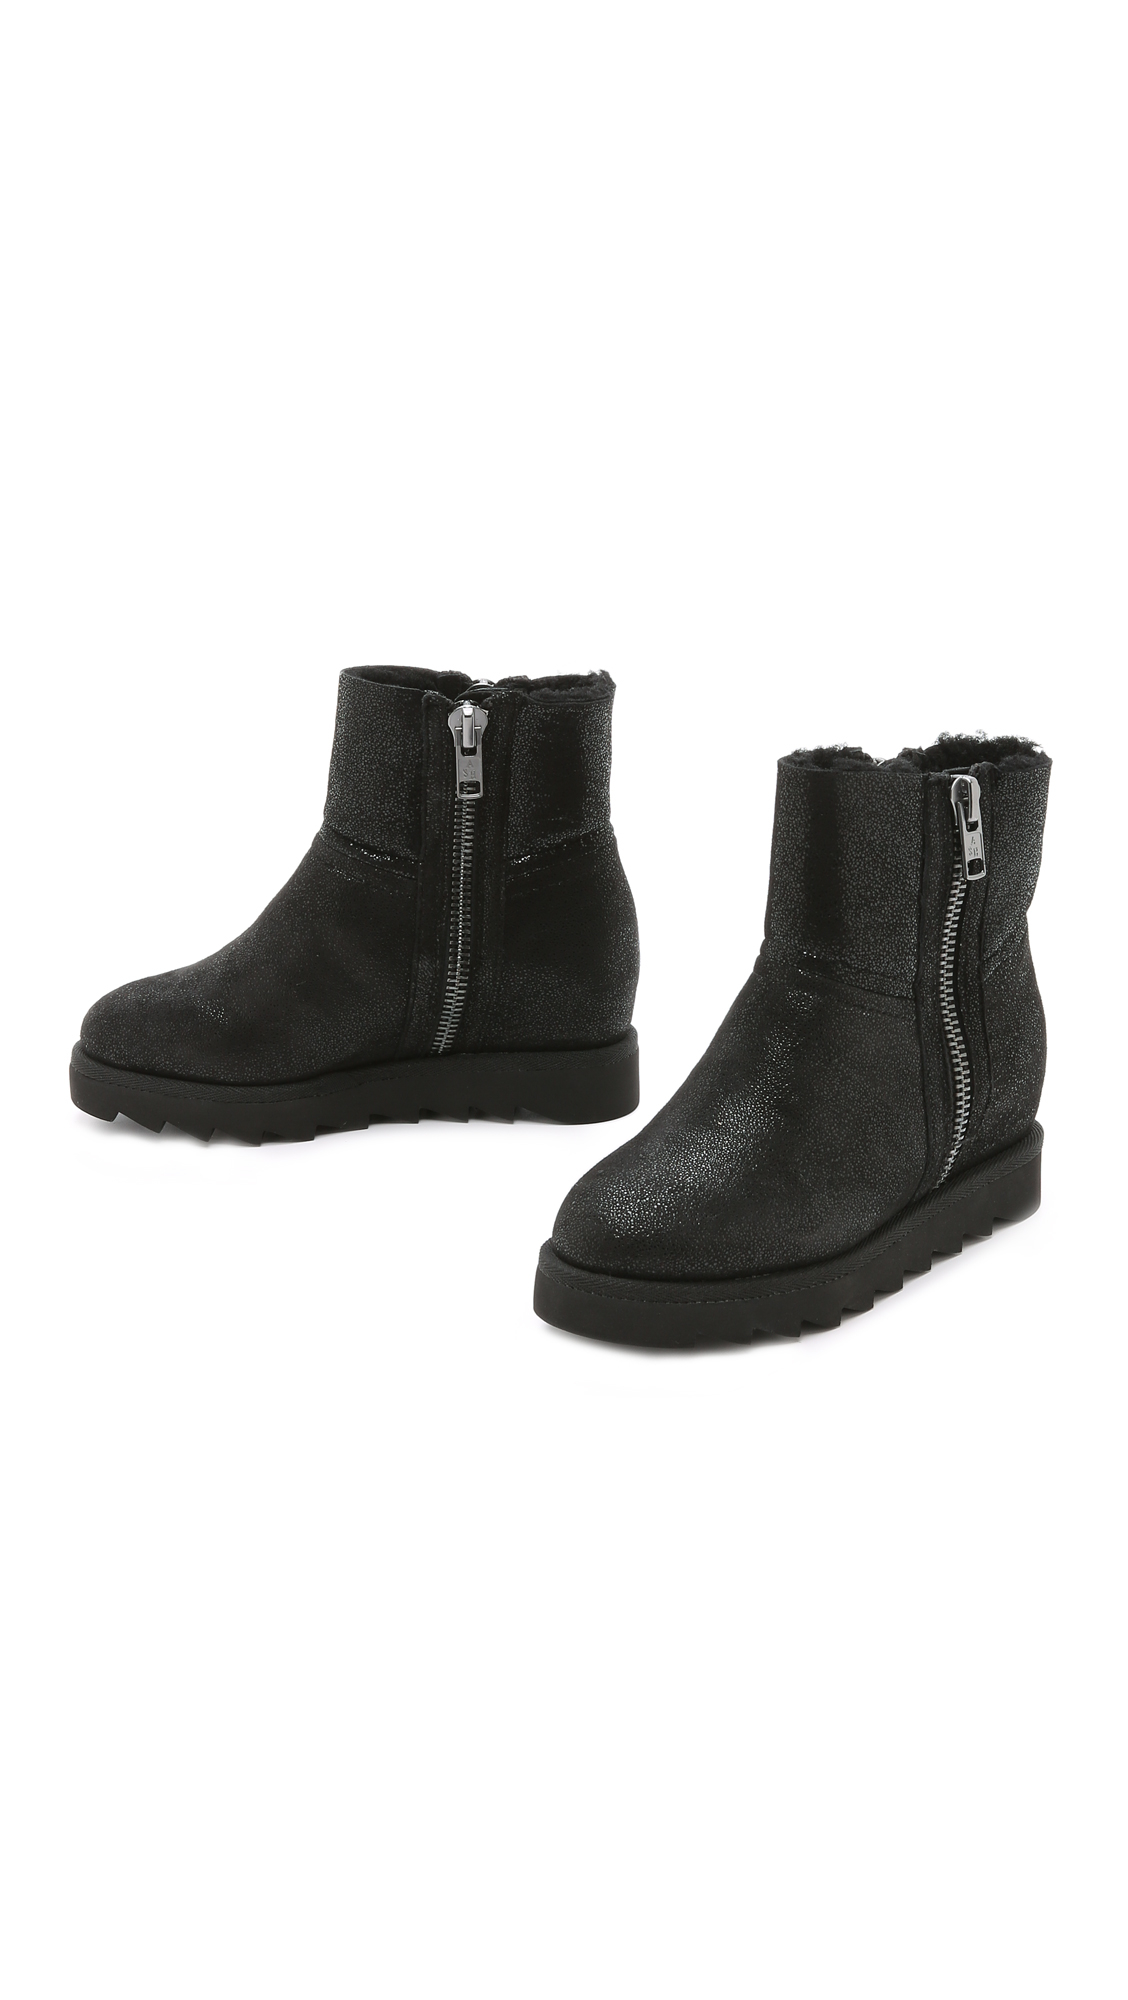 Ash Yang Glitter Booties - Black/black